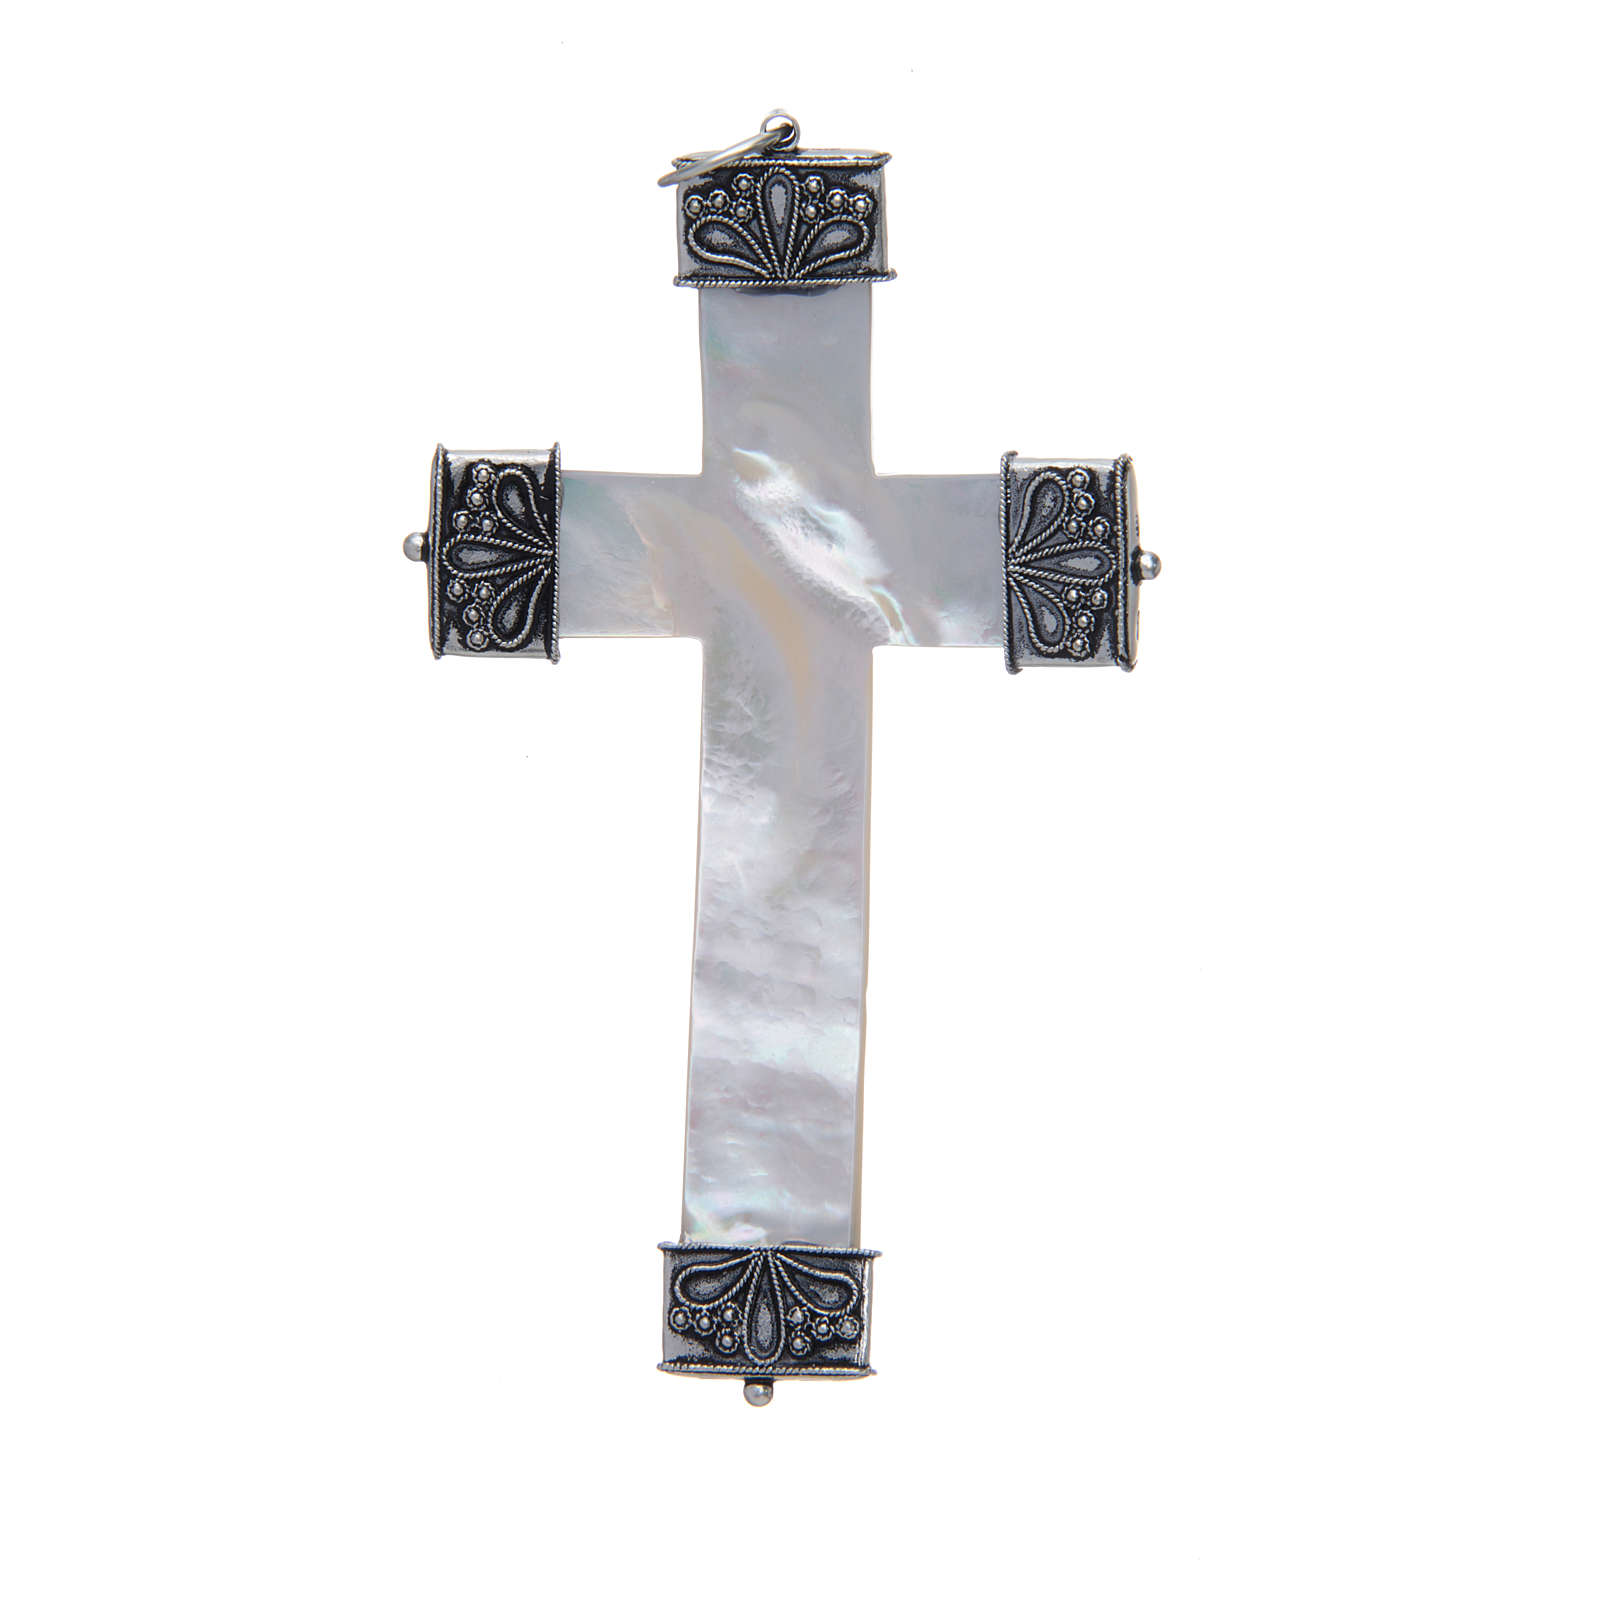 Croce pettorale madreperla e argento 800 3